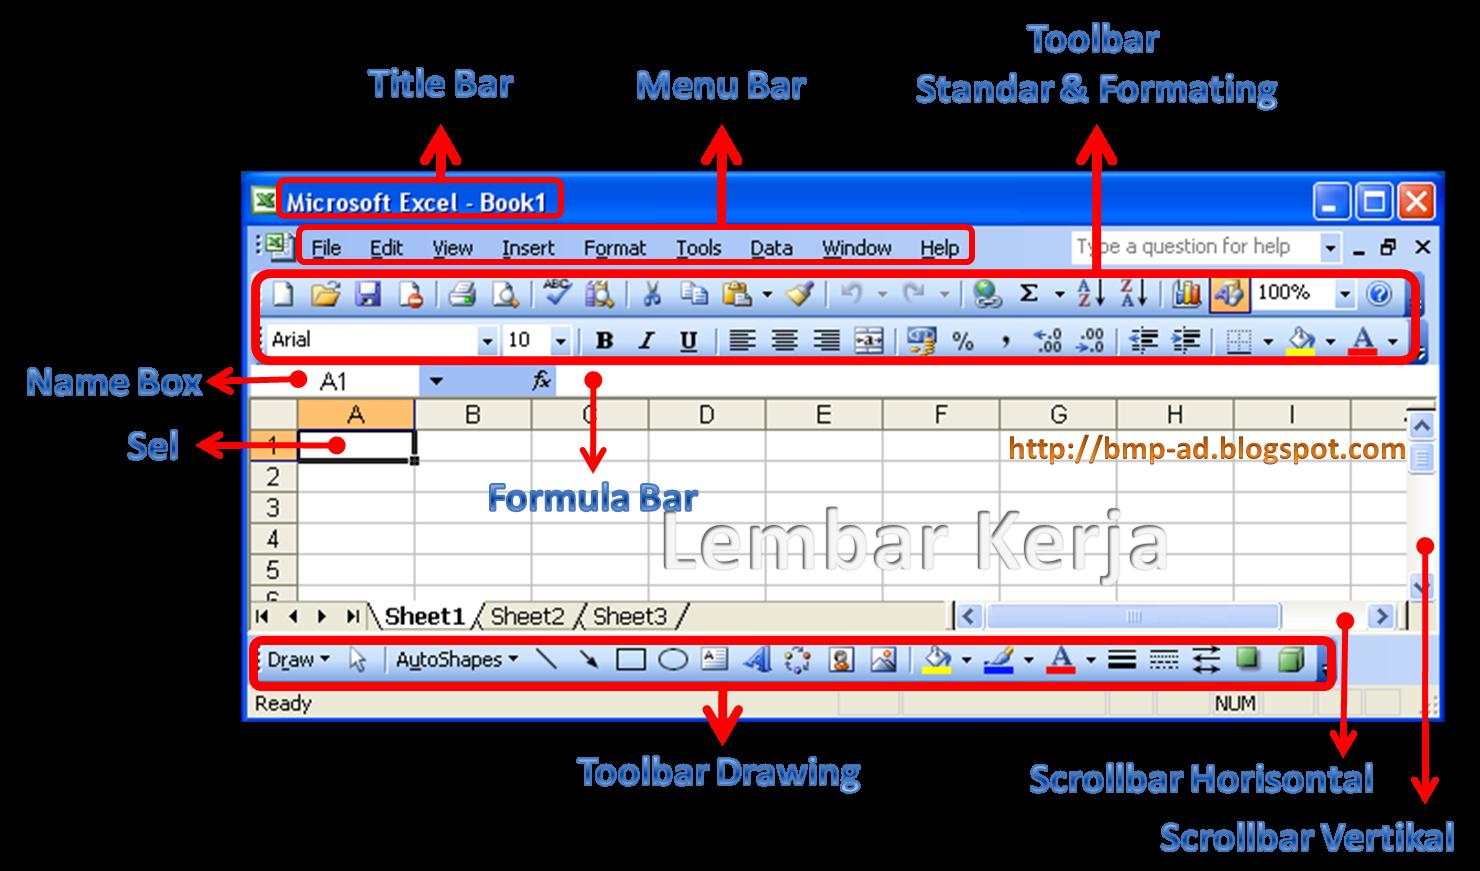 Fungsi Icon Pada Menu Bar Microsoft Excel